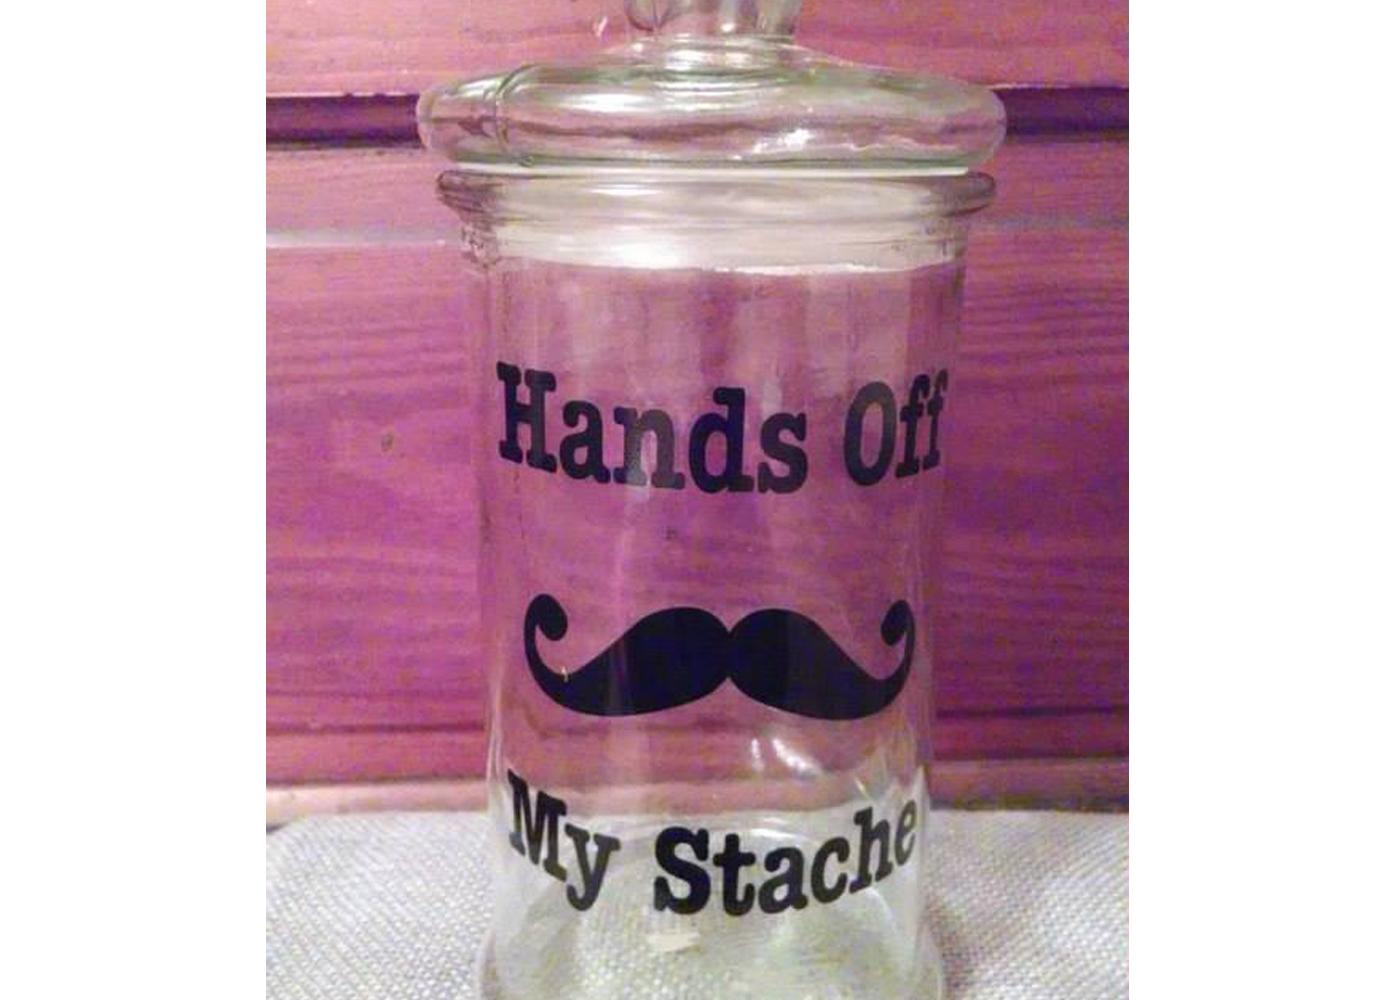 stache-vinyl-decal-on-glass-jar.jpg